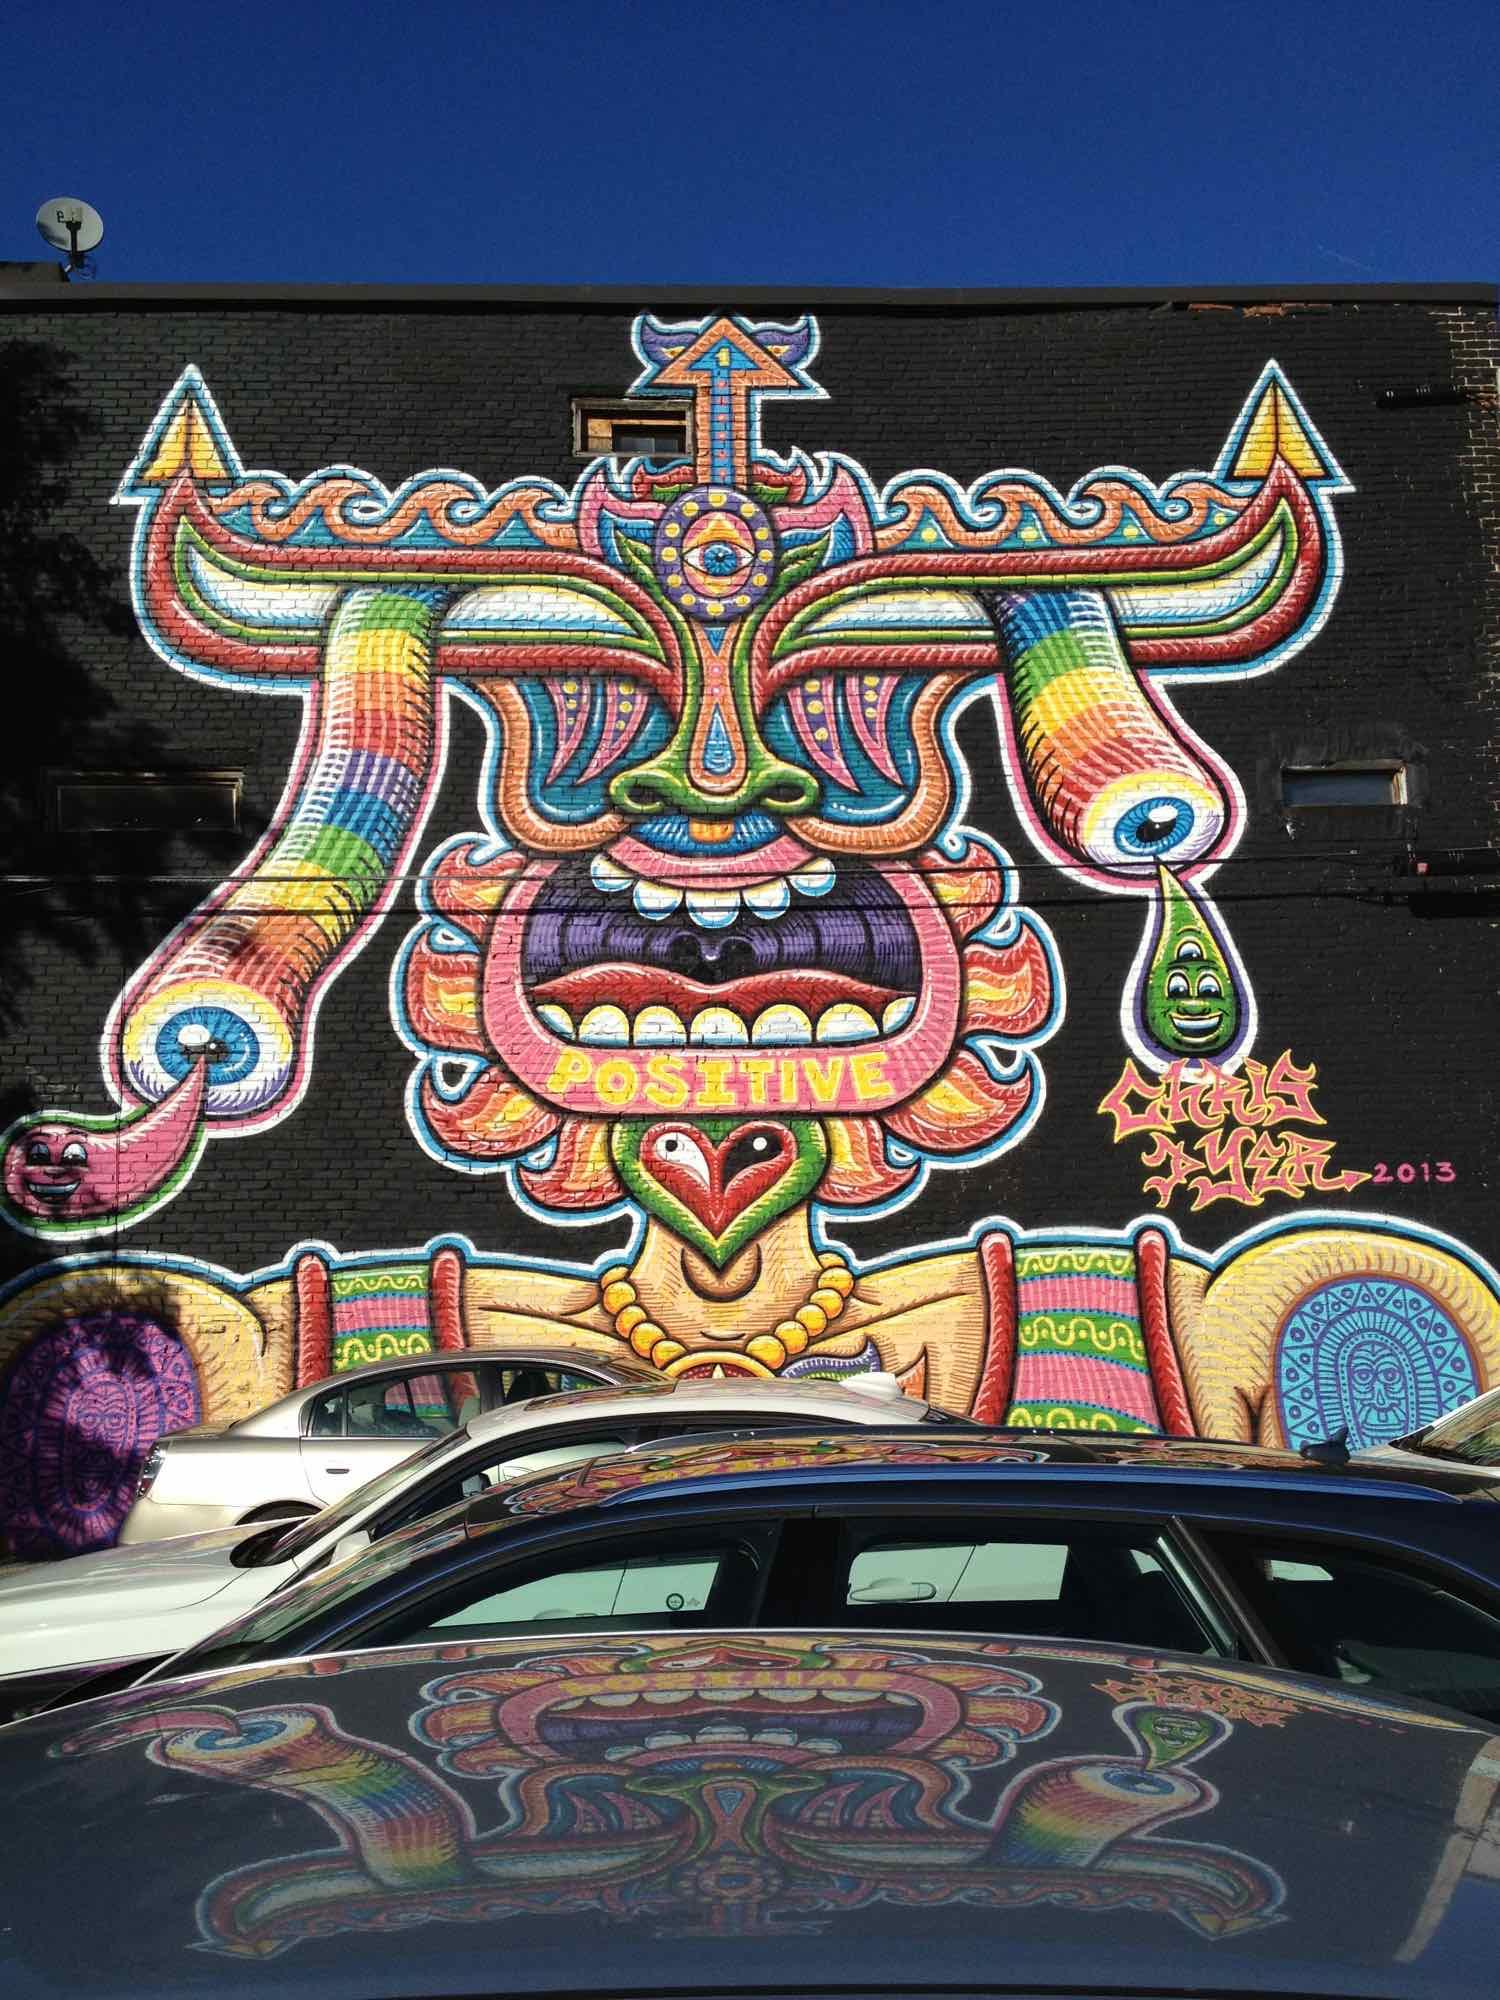 The_Walls_Of_Montreal-Ezra_Soiferman - 15.jpg